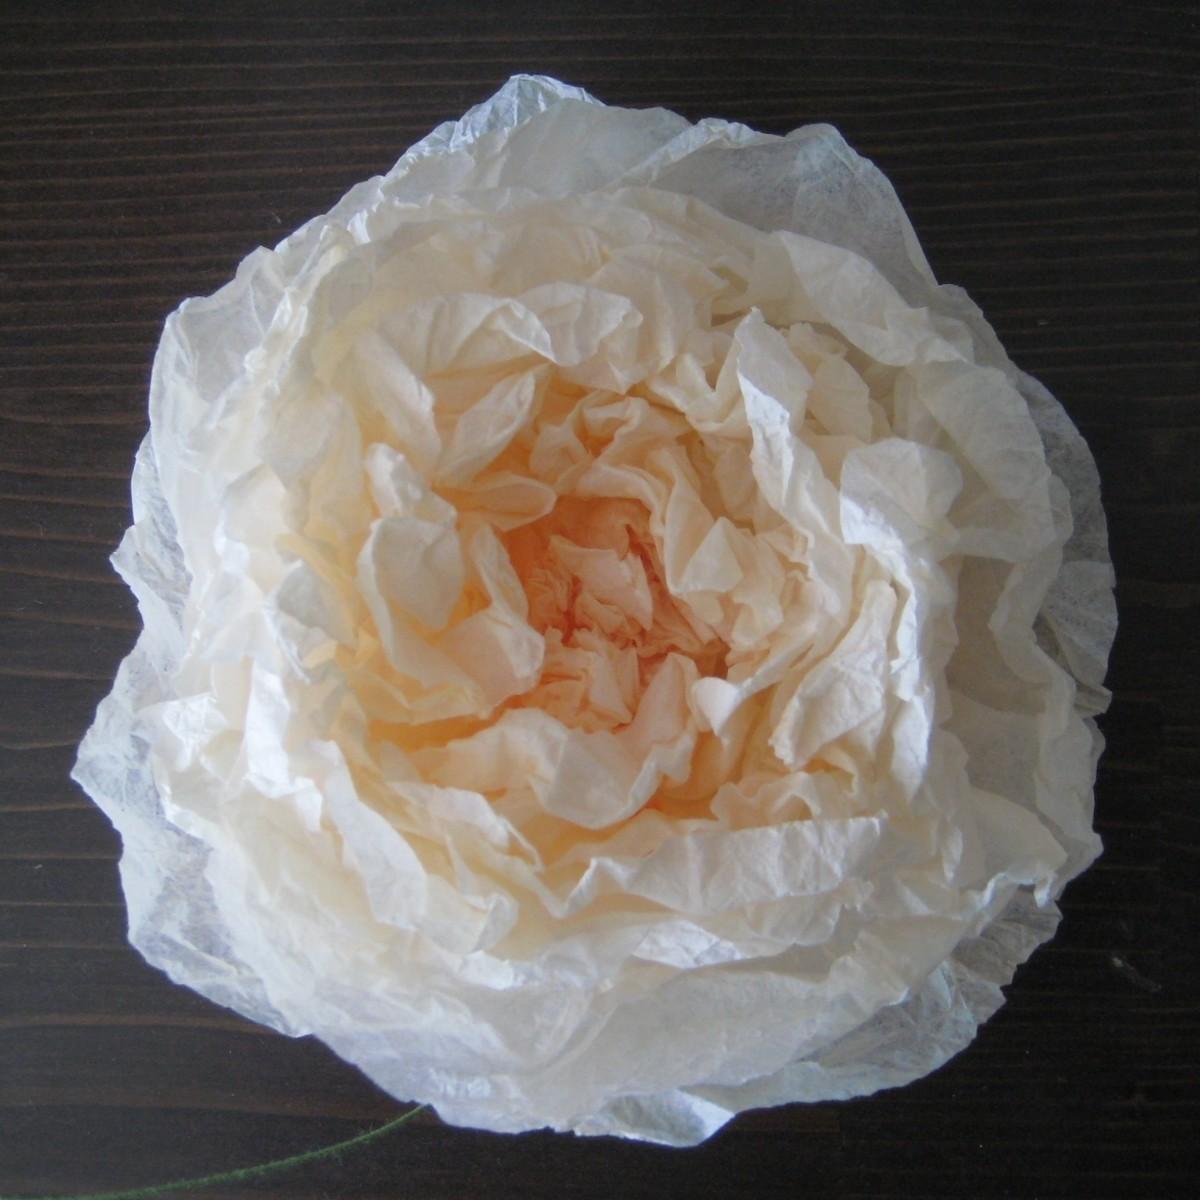 My second flower was a big tea rose.